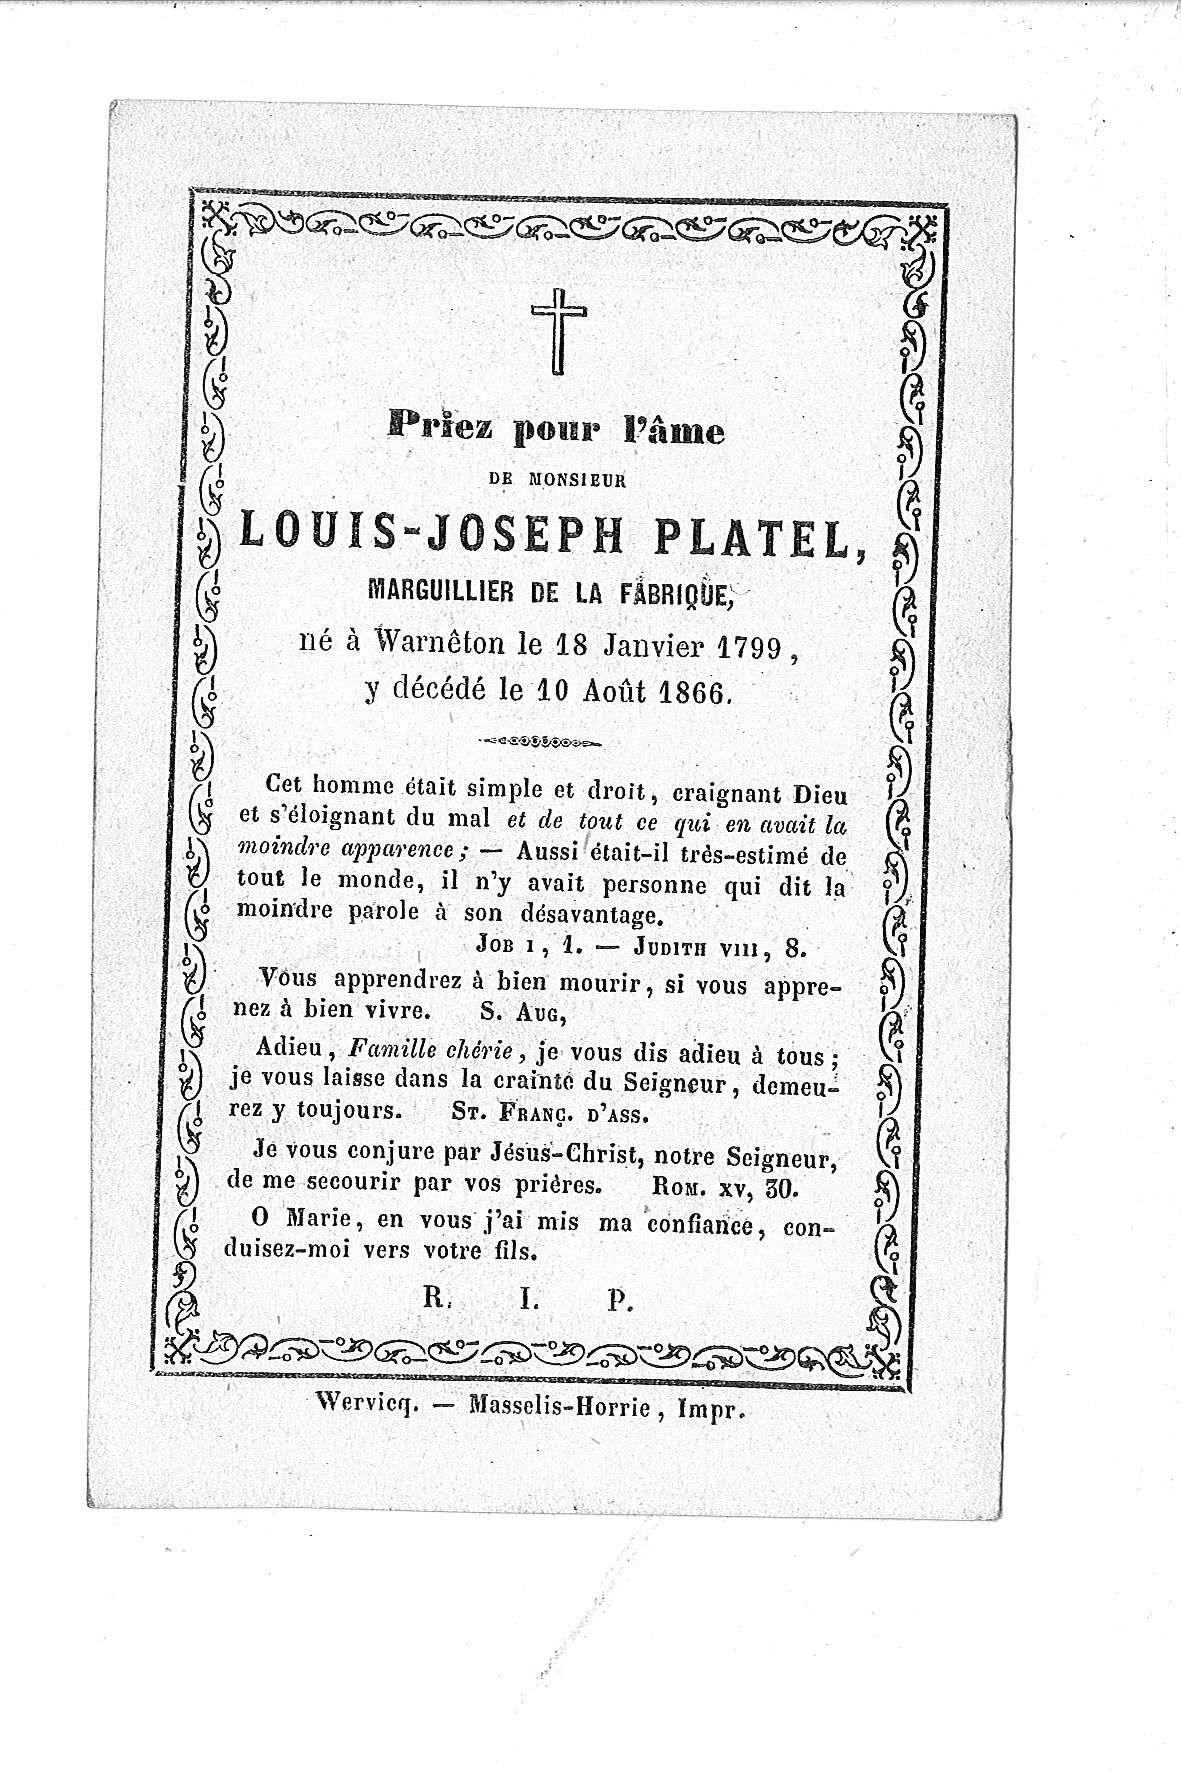 Louis-Joseph(1866)20100415131555_00015.jpg